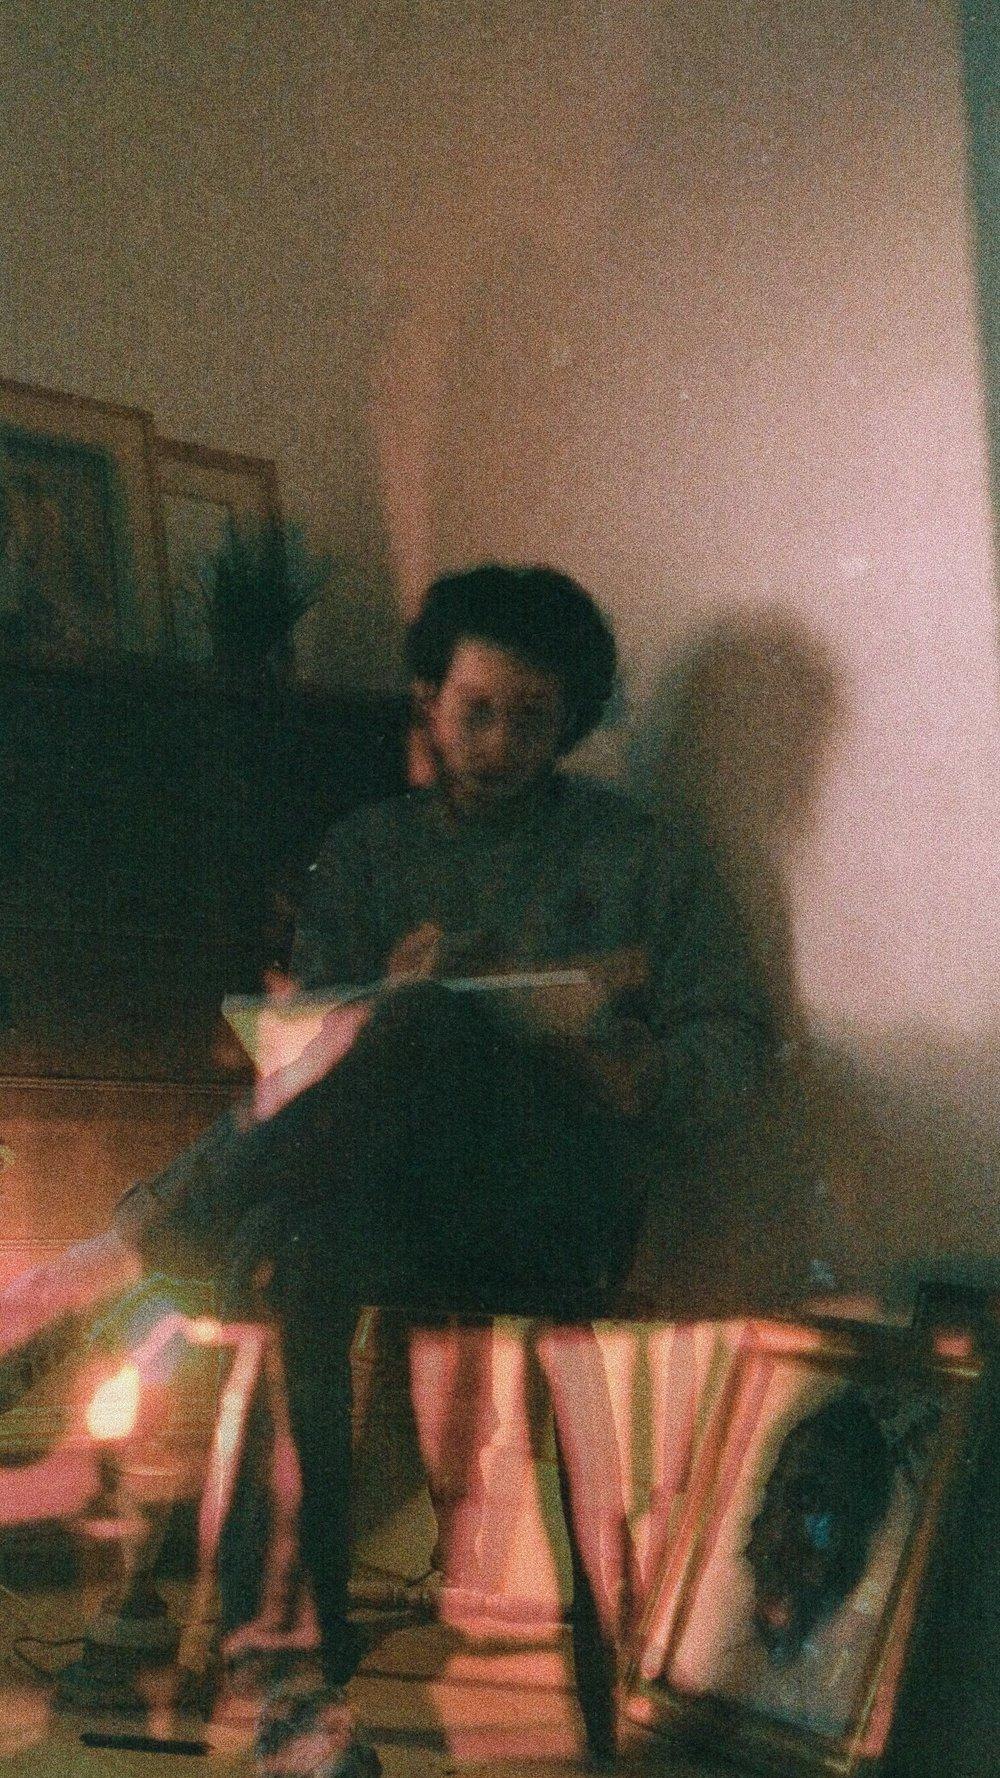 austin frantz - self taught, born november 1996